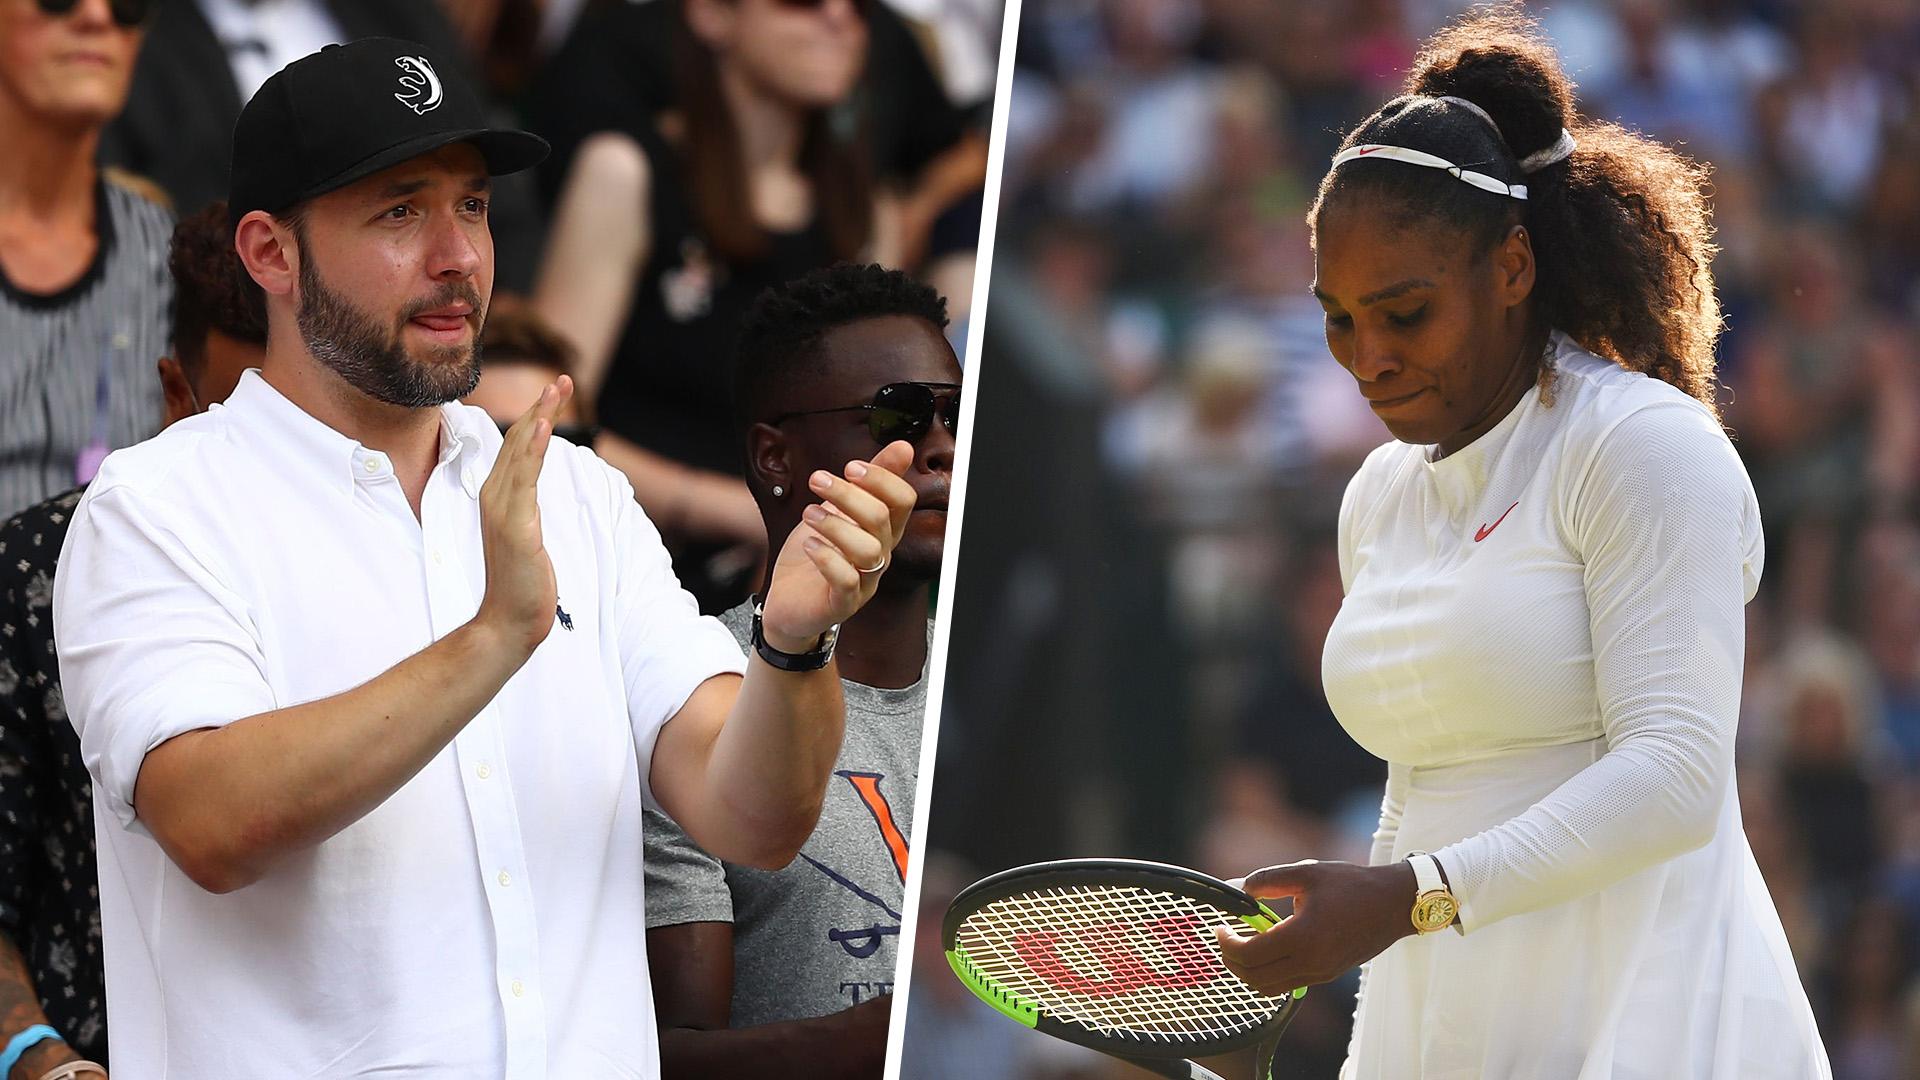 Serena Williams' husband pens emotional note following her Wimbledon loss